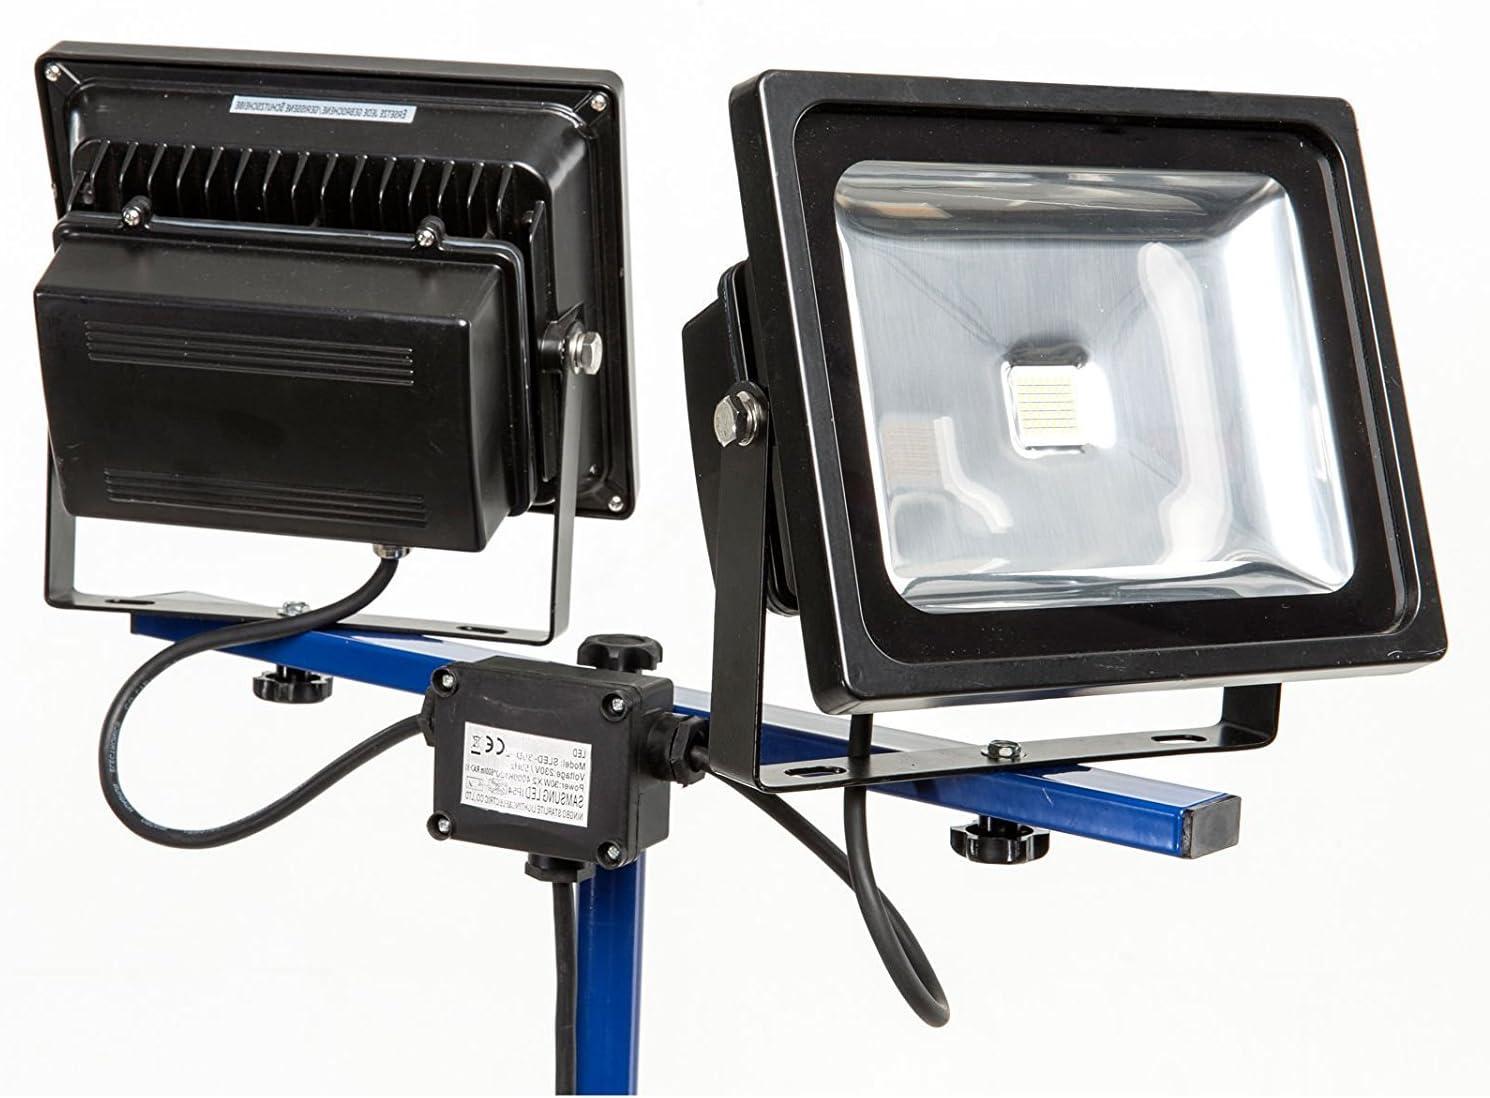 MCTECH/® 50-150cm GelbTeleskop Stativ Flutlicht St/änder Strahler Stahlstativ f/ür Baustrahler LED Fluter Arbeitslampe